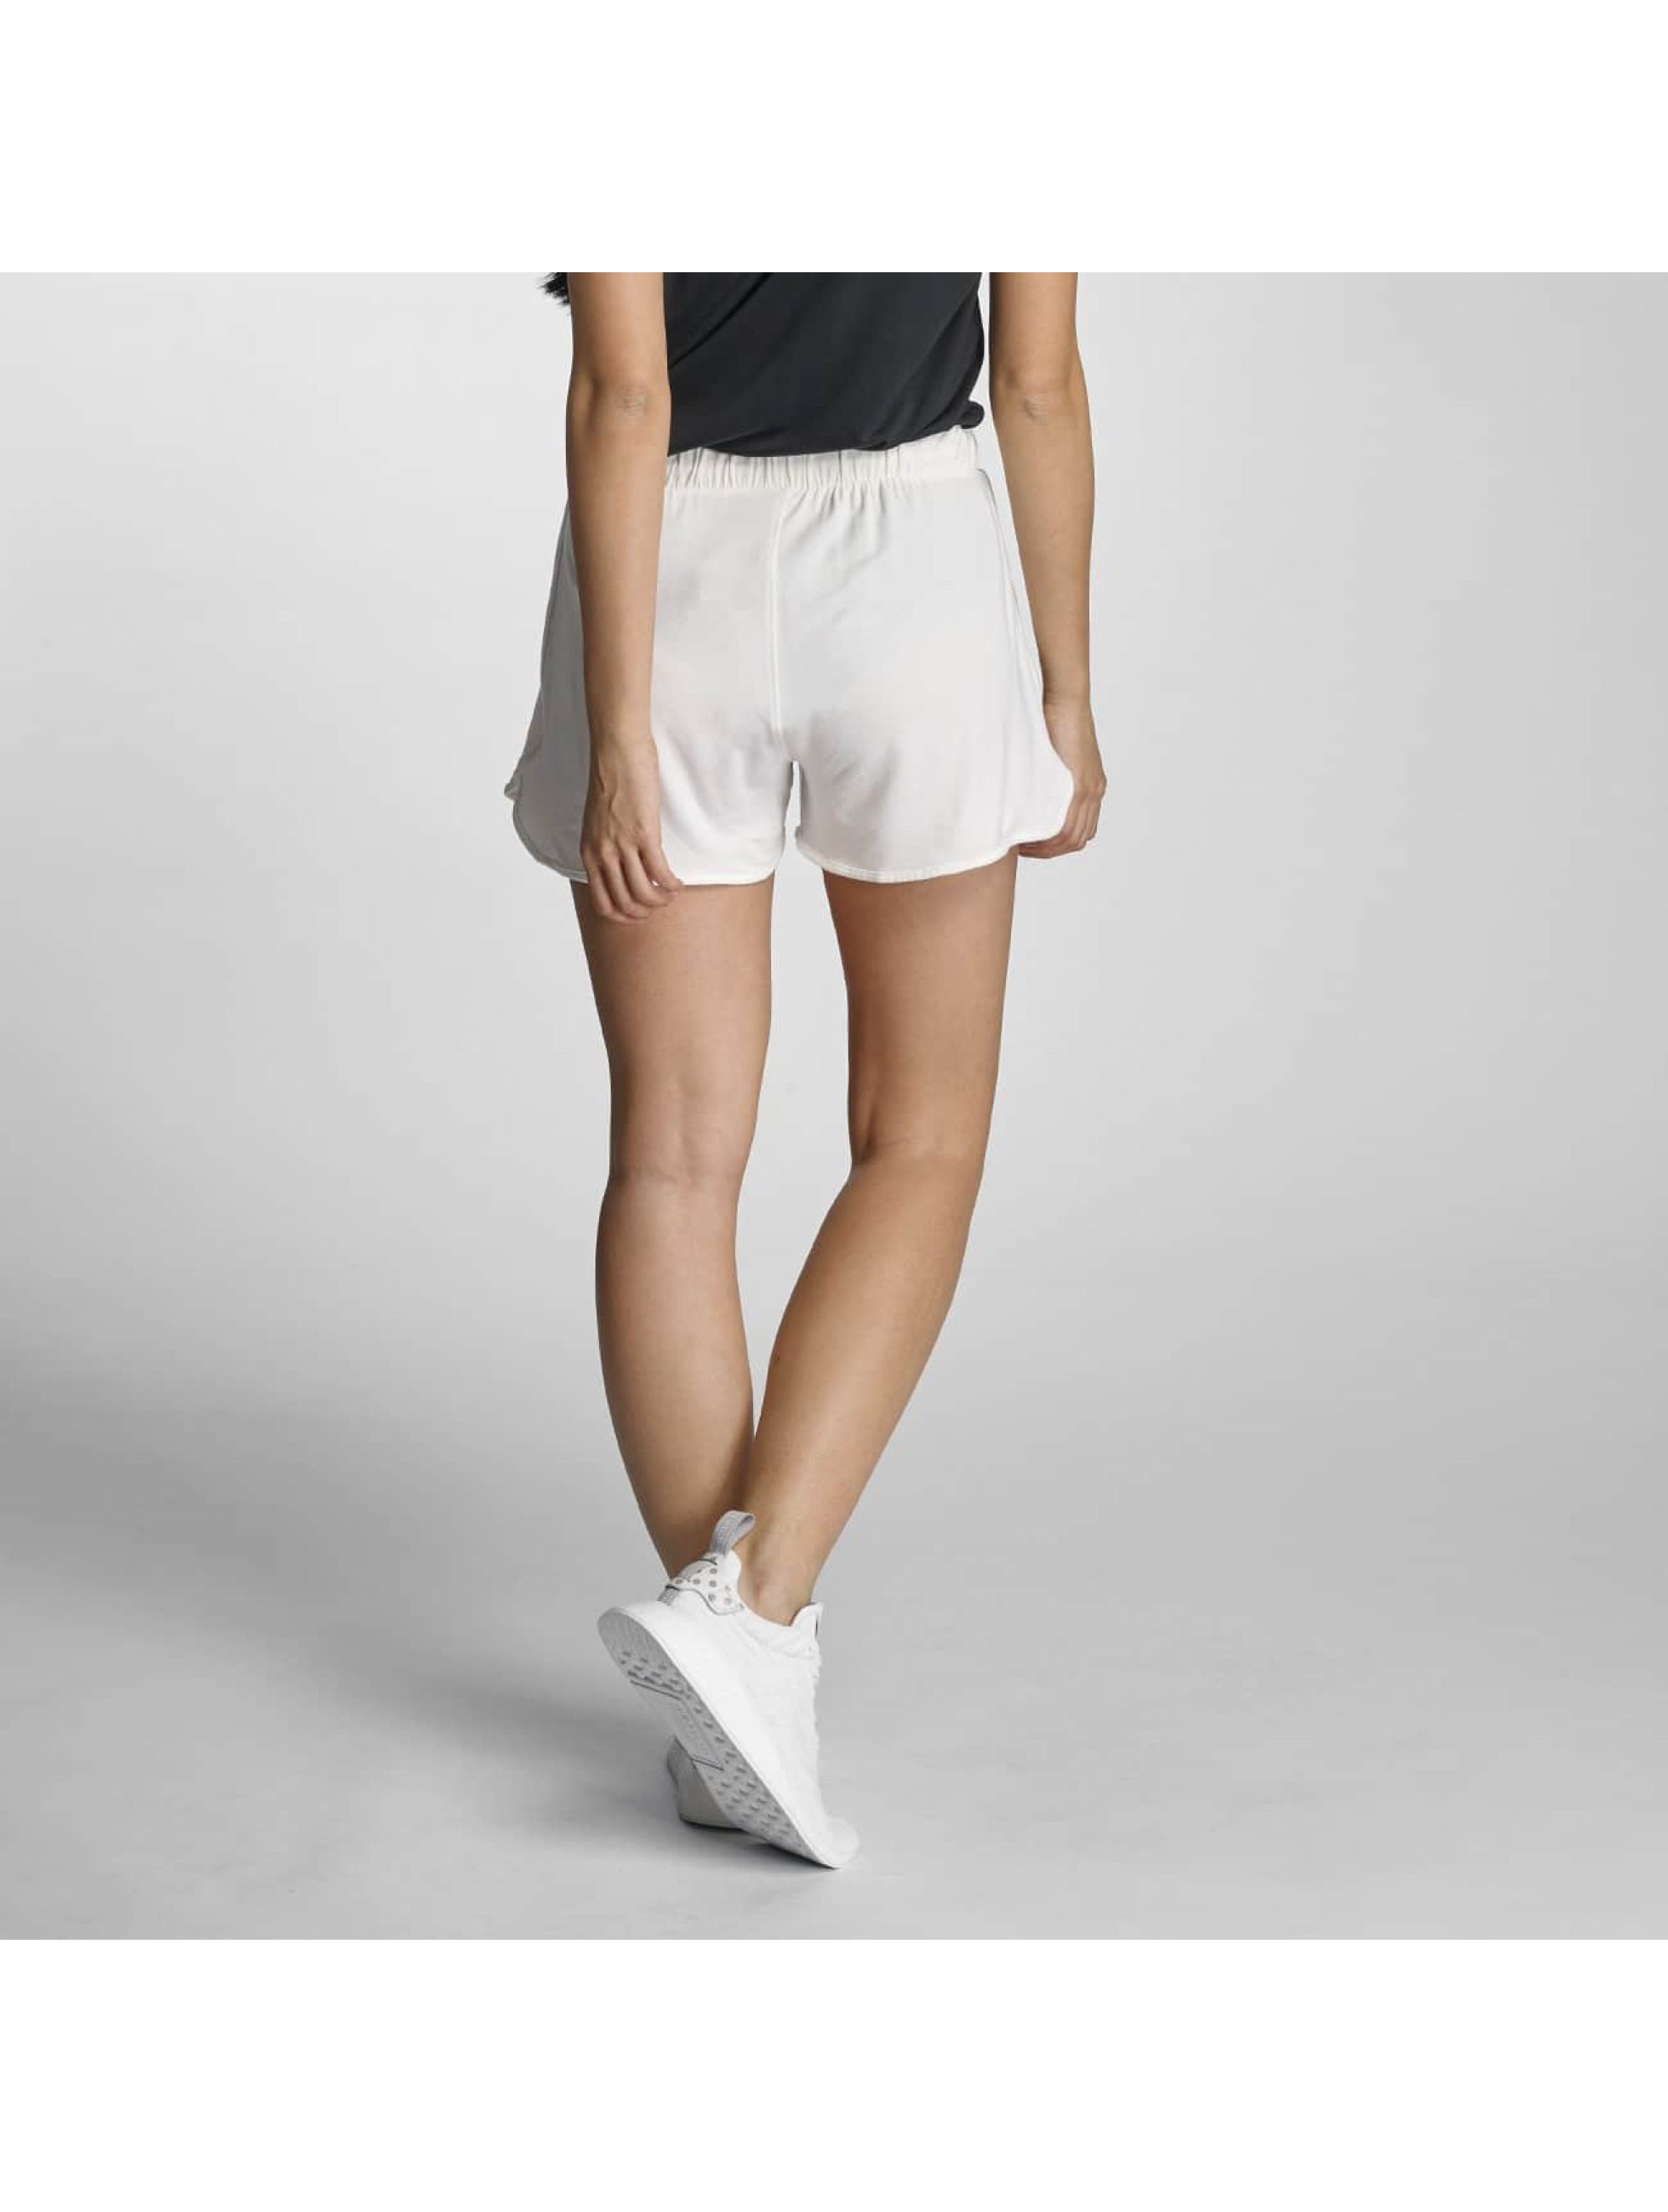 Vero Moda Short vmTrue white